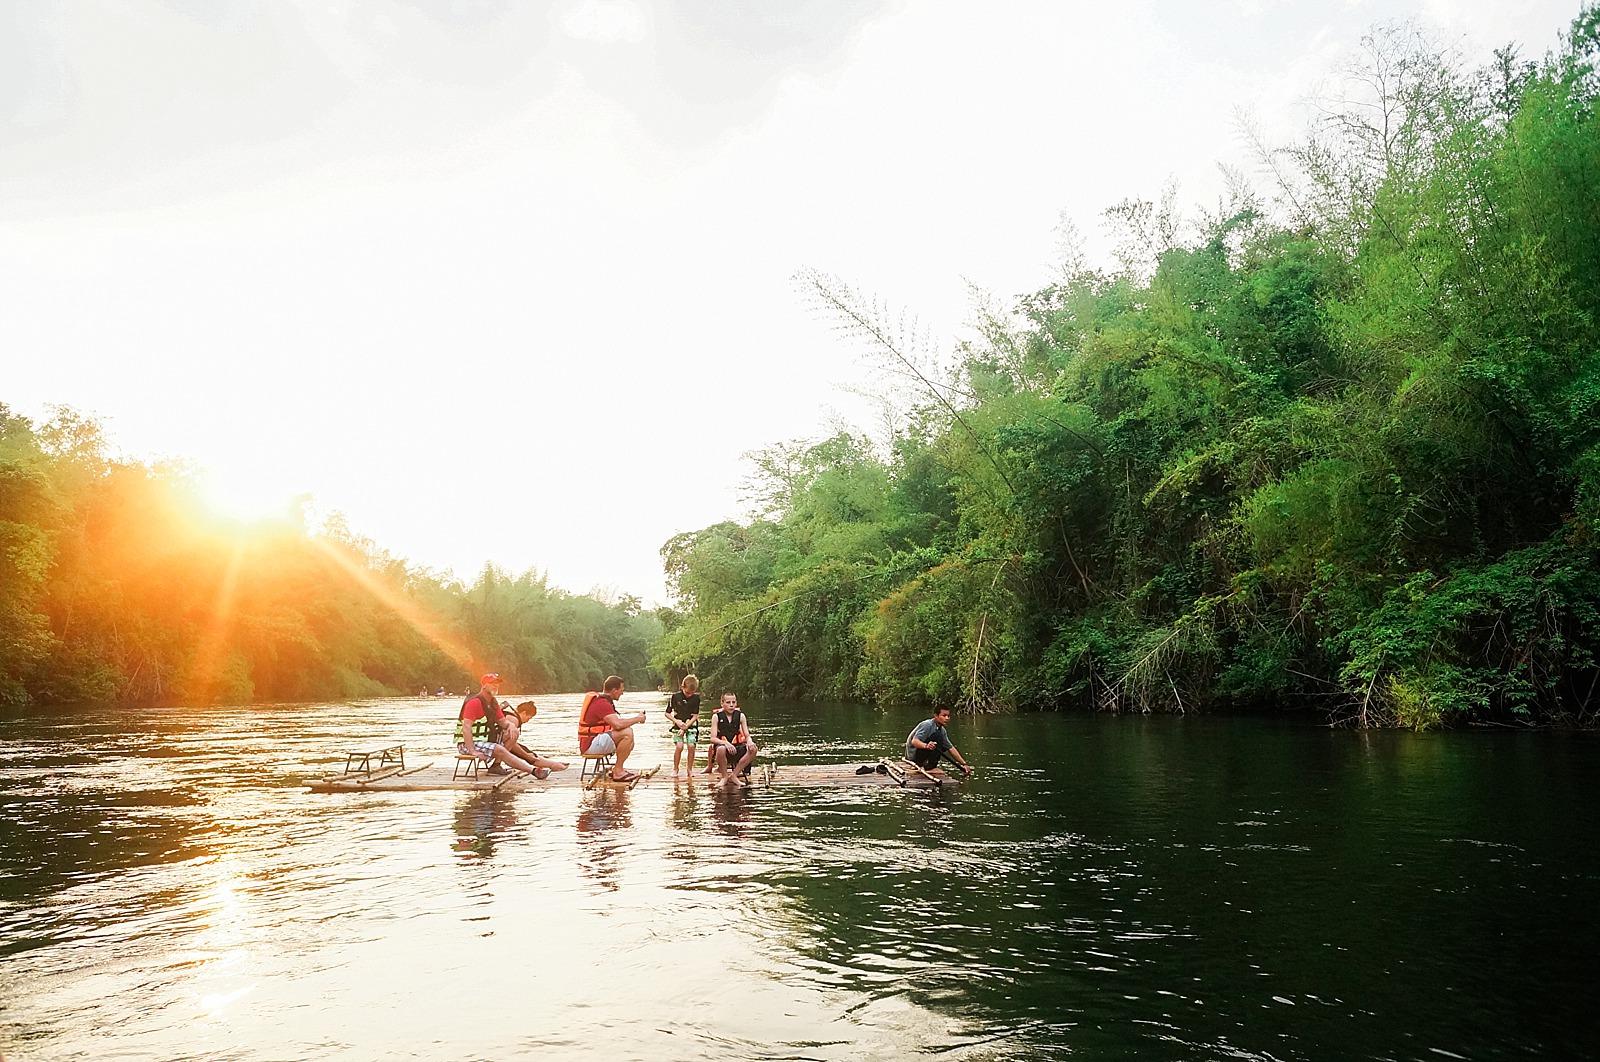 Thailand-diana-elizabeth-travel-blogger-phoenix-282